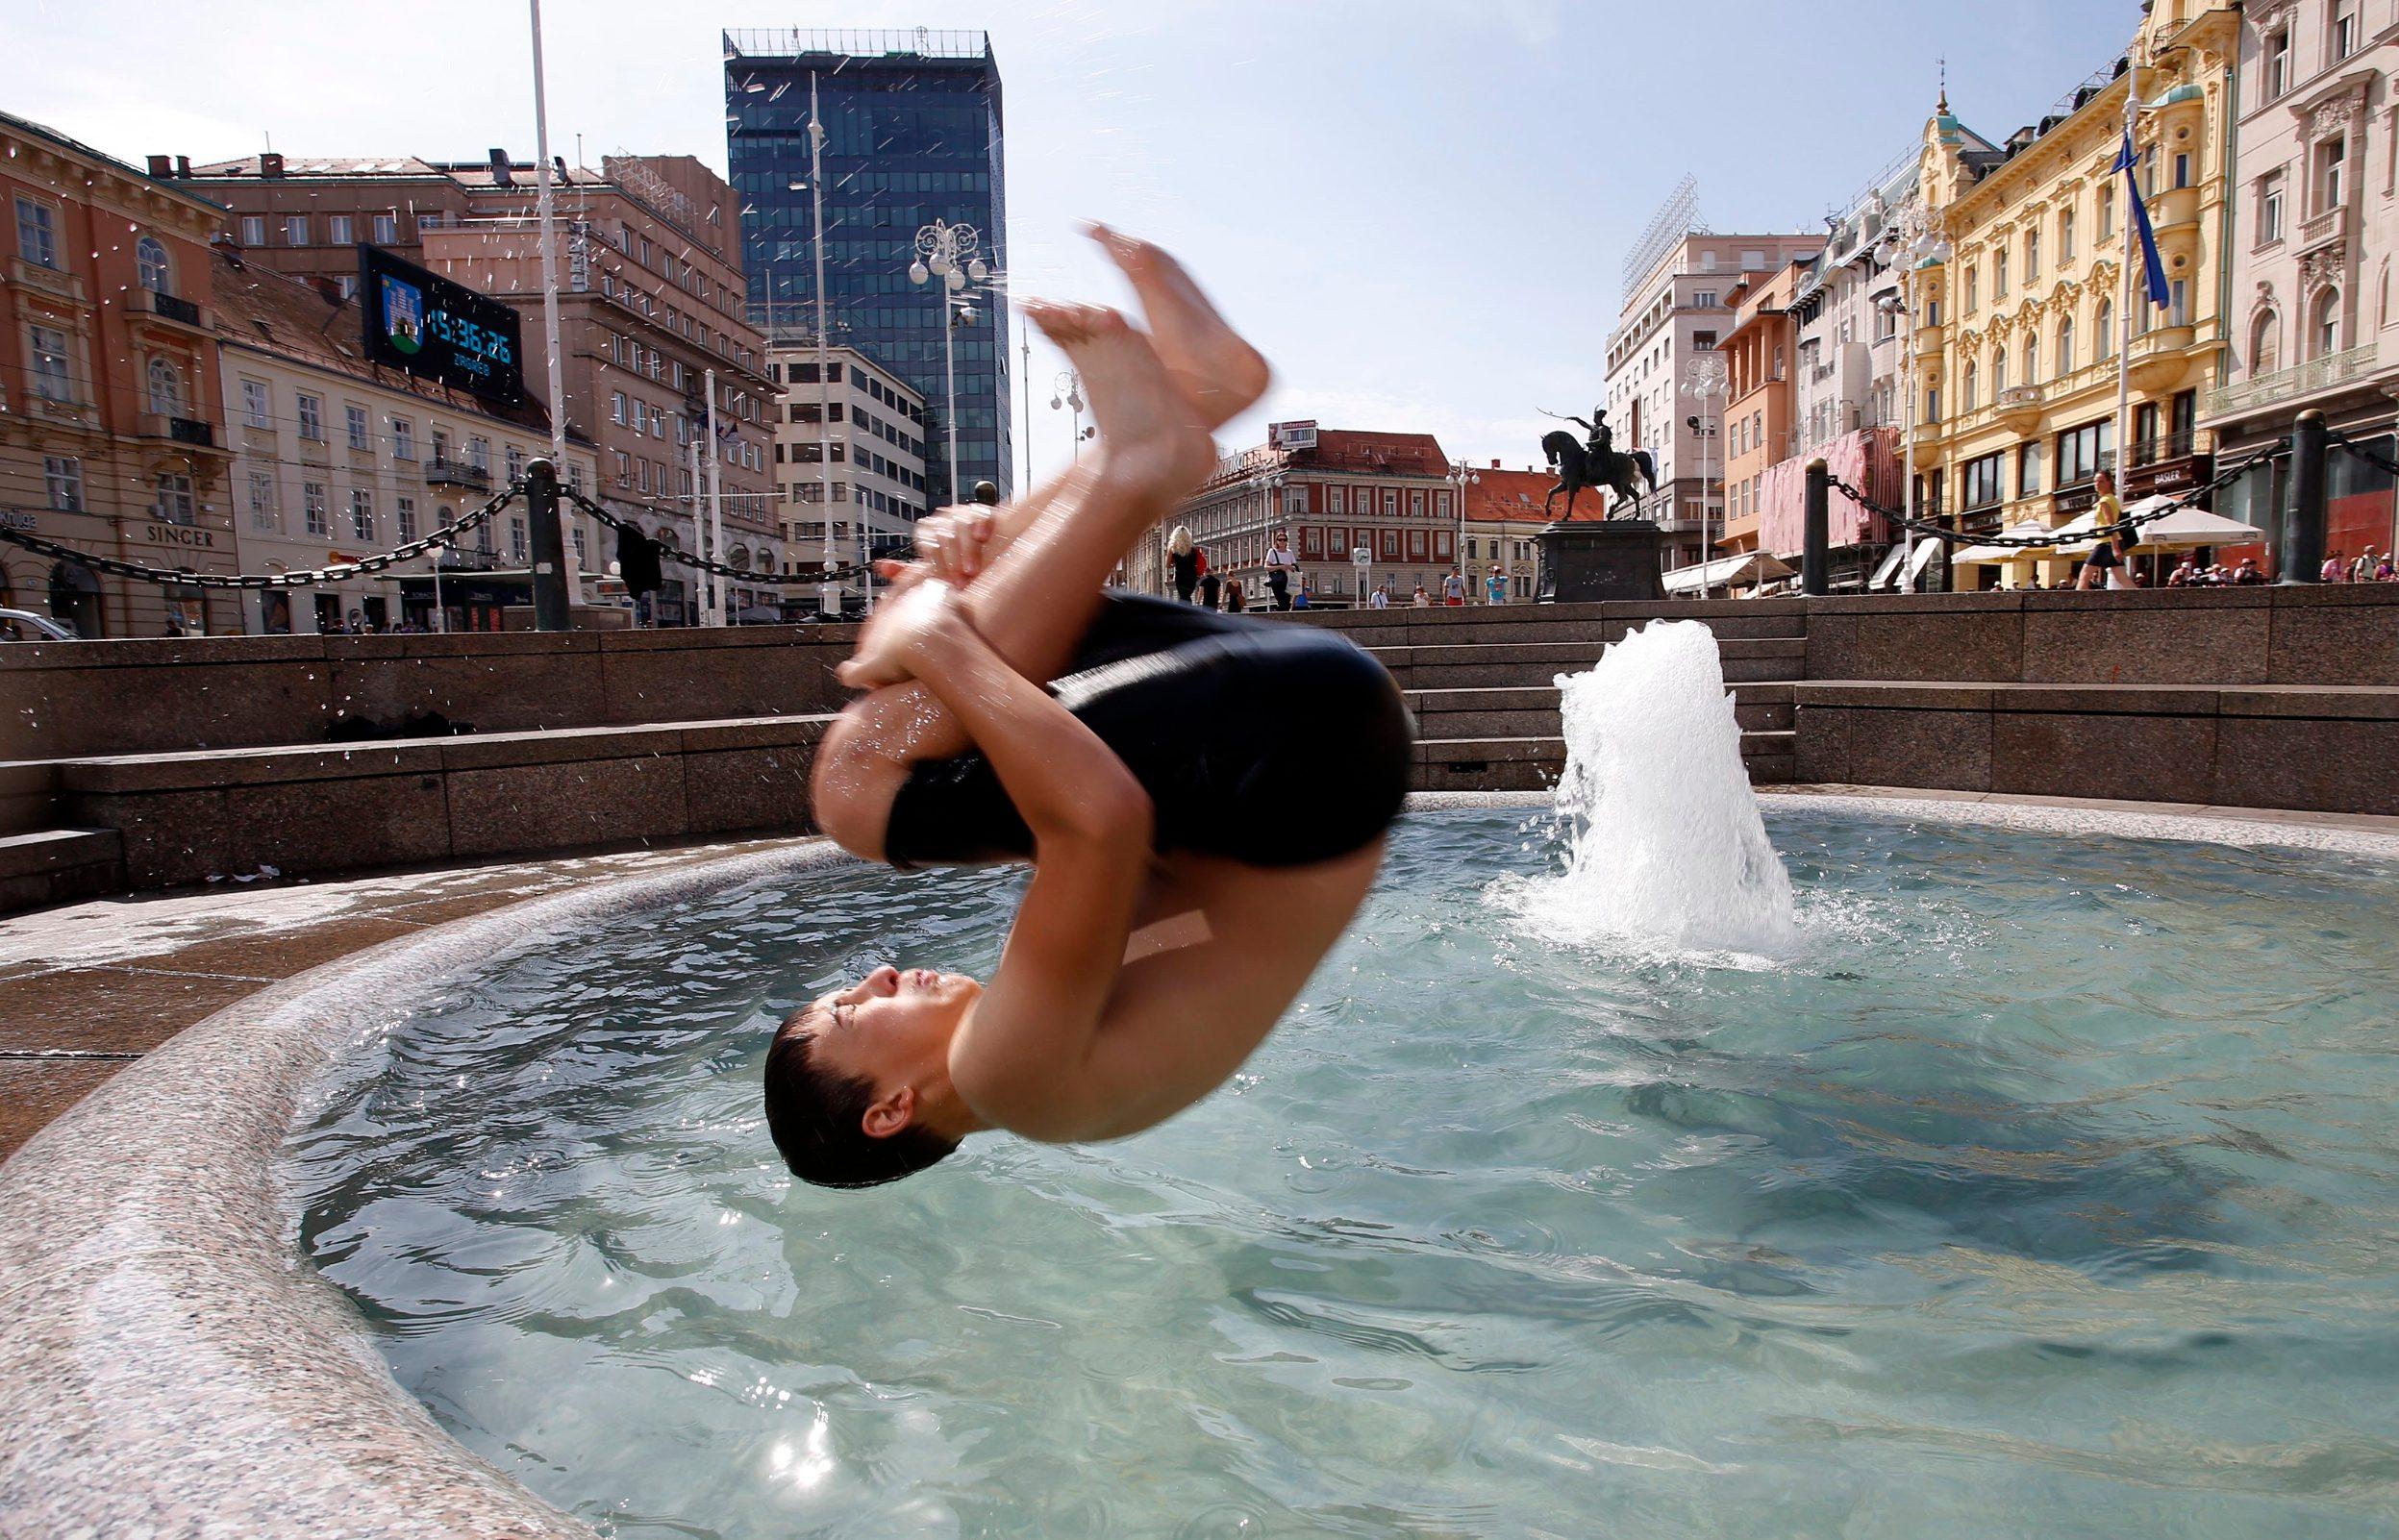 Zagreb, 070819. Trg bana Jelacica. Decko iz centra Zagreba skakao u Mandusevac. Foto: Damjan Tadic / CROPIX